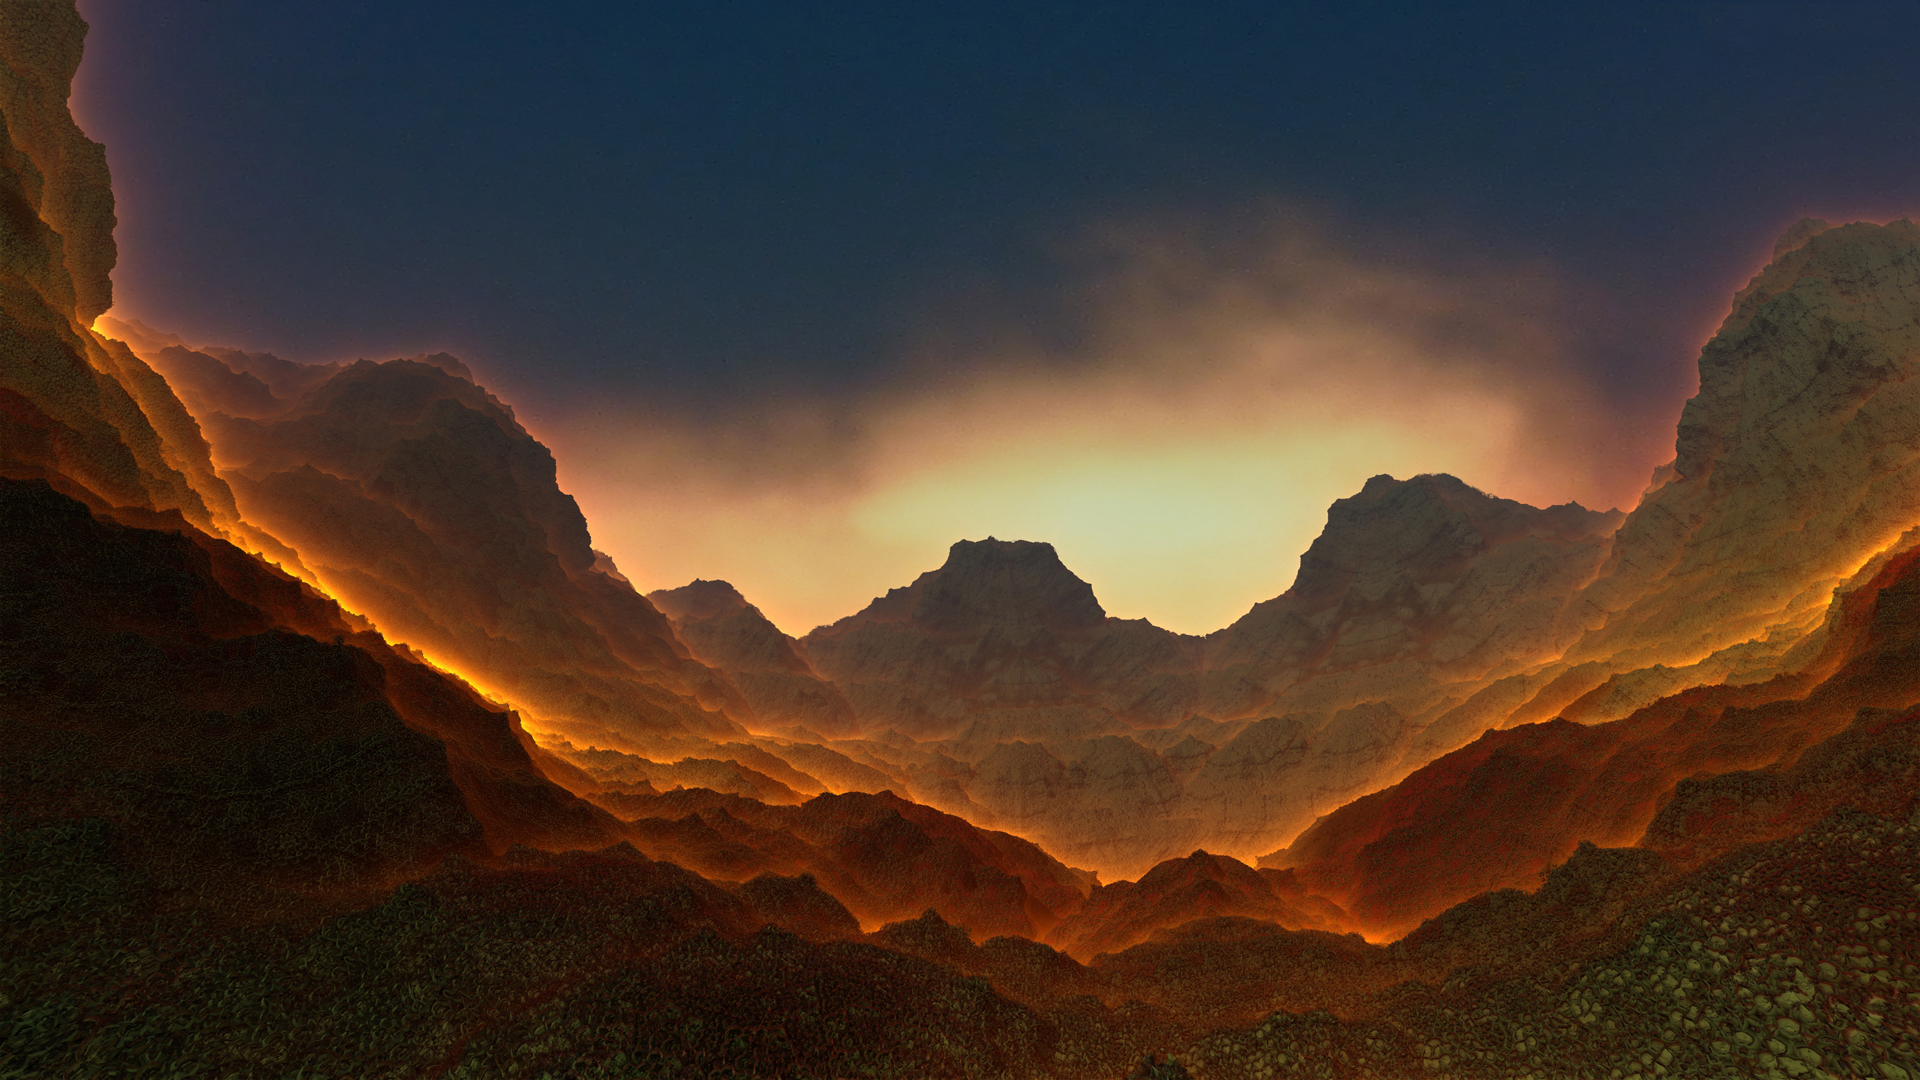 Valley Burn Between Mountains Hd Wallpaper